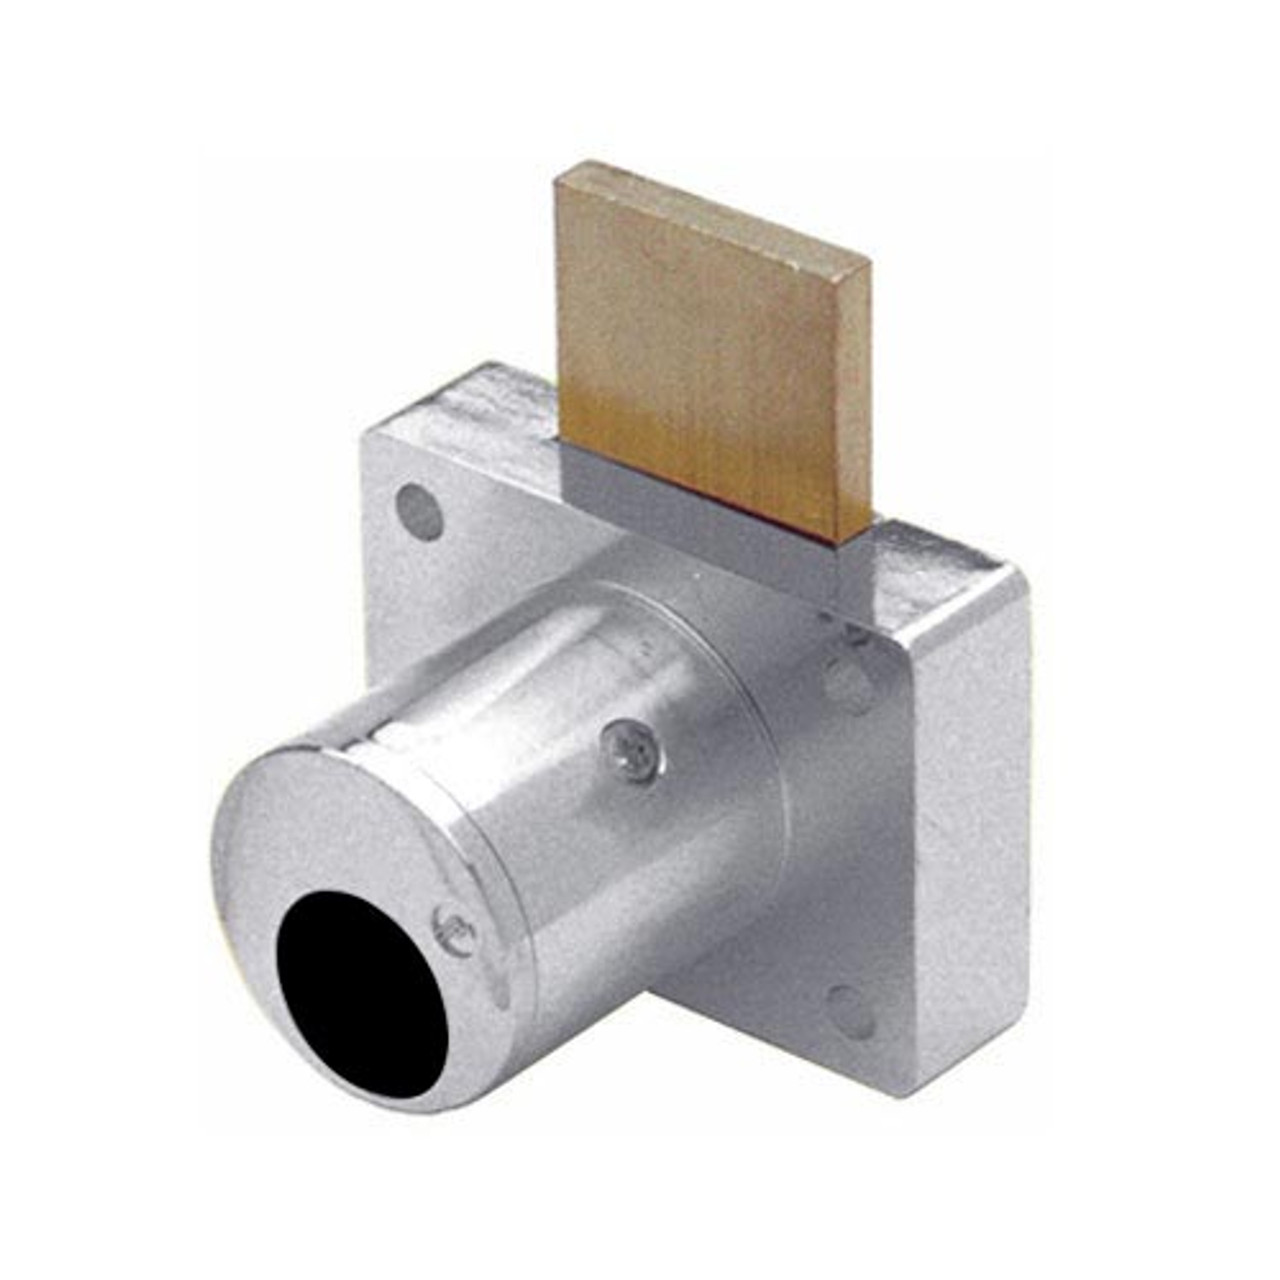 Olympus 800LCM-26D Cabinet Drawer Deadbolt Less Cylinder Medeco Lock in Satin Chrome